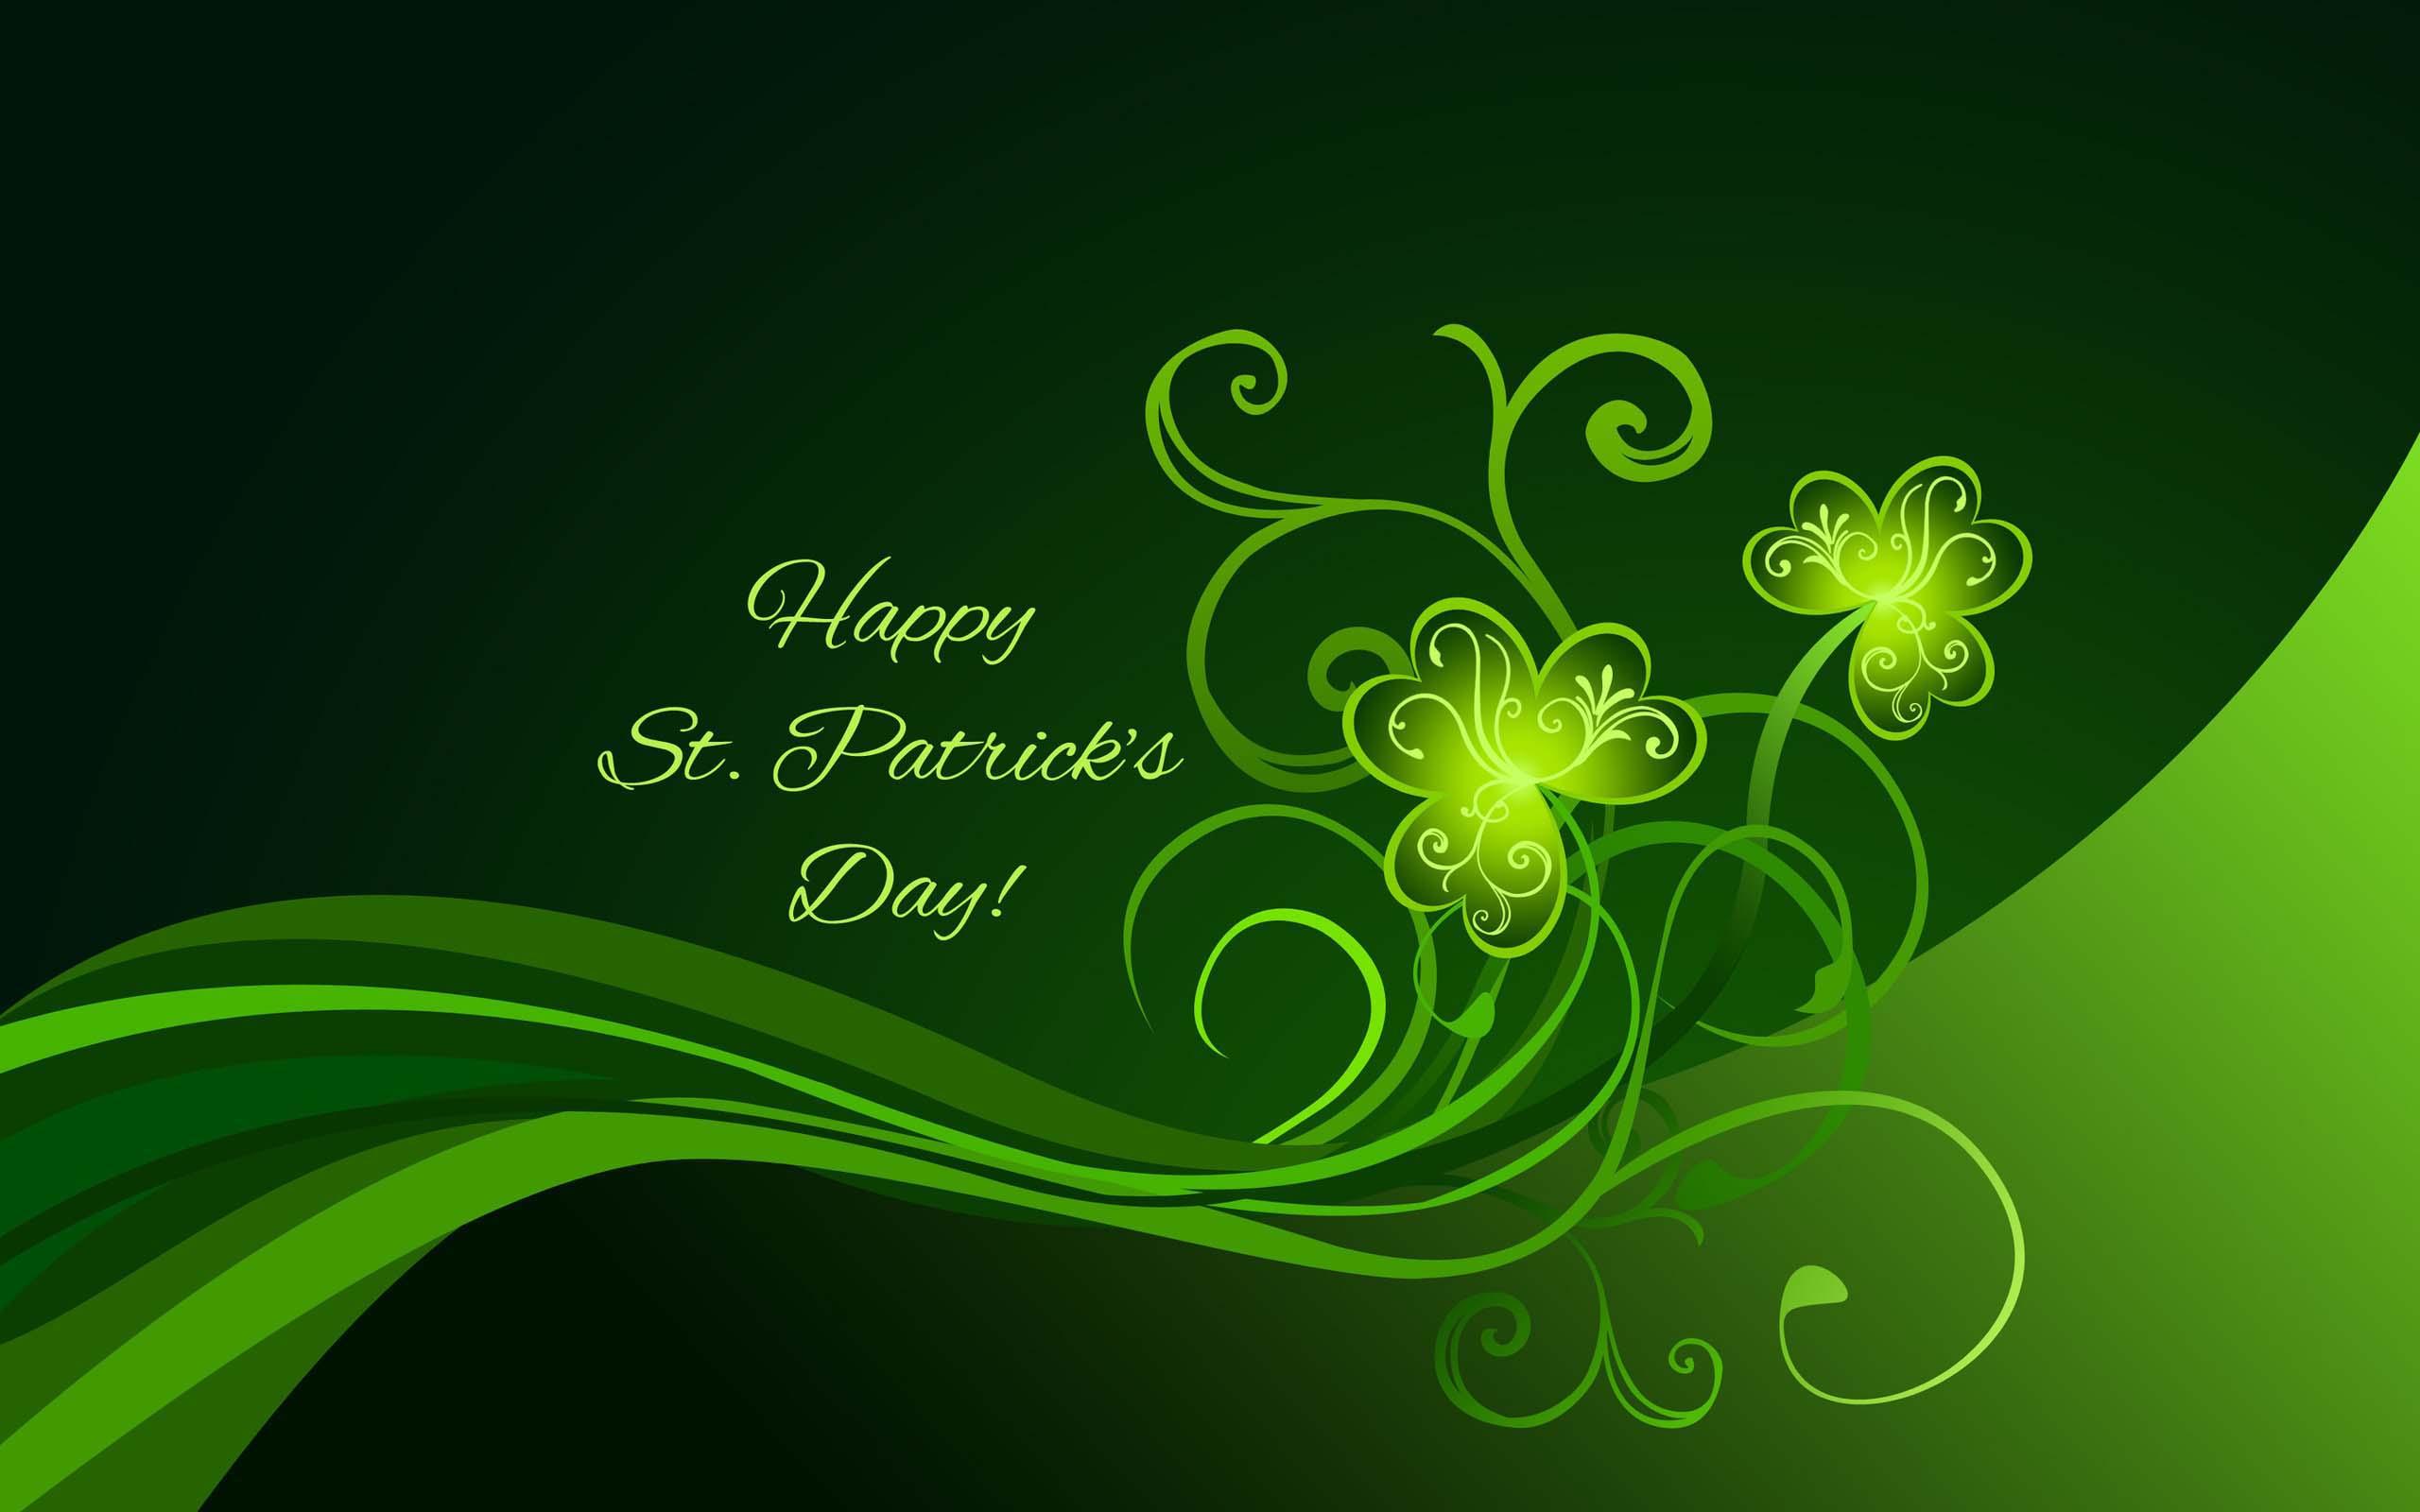 St. Patrick's Day HD Wallpaper | Wide Screen Wallpaper 1080p,2K,4K